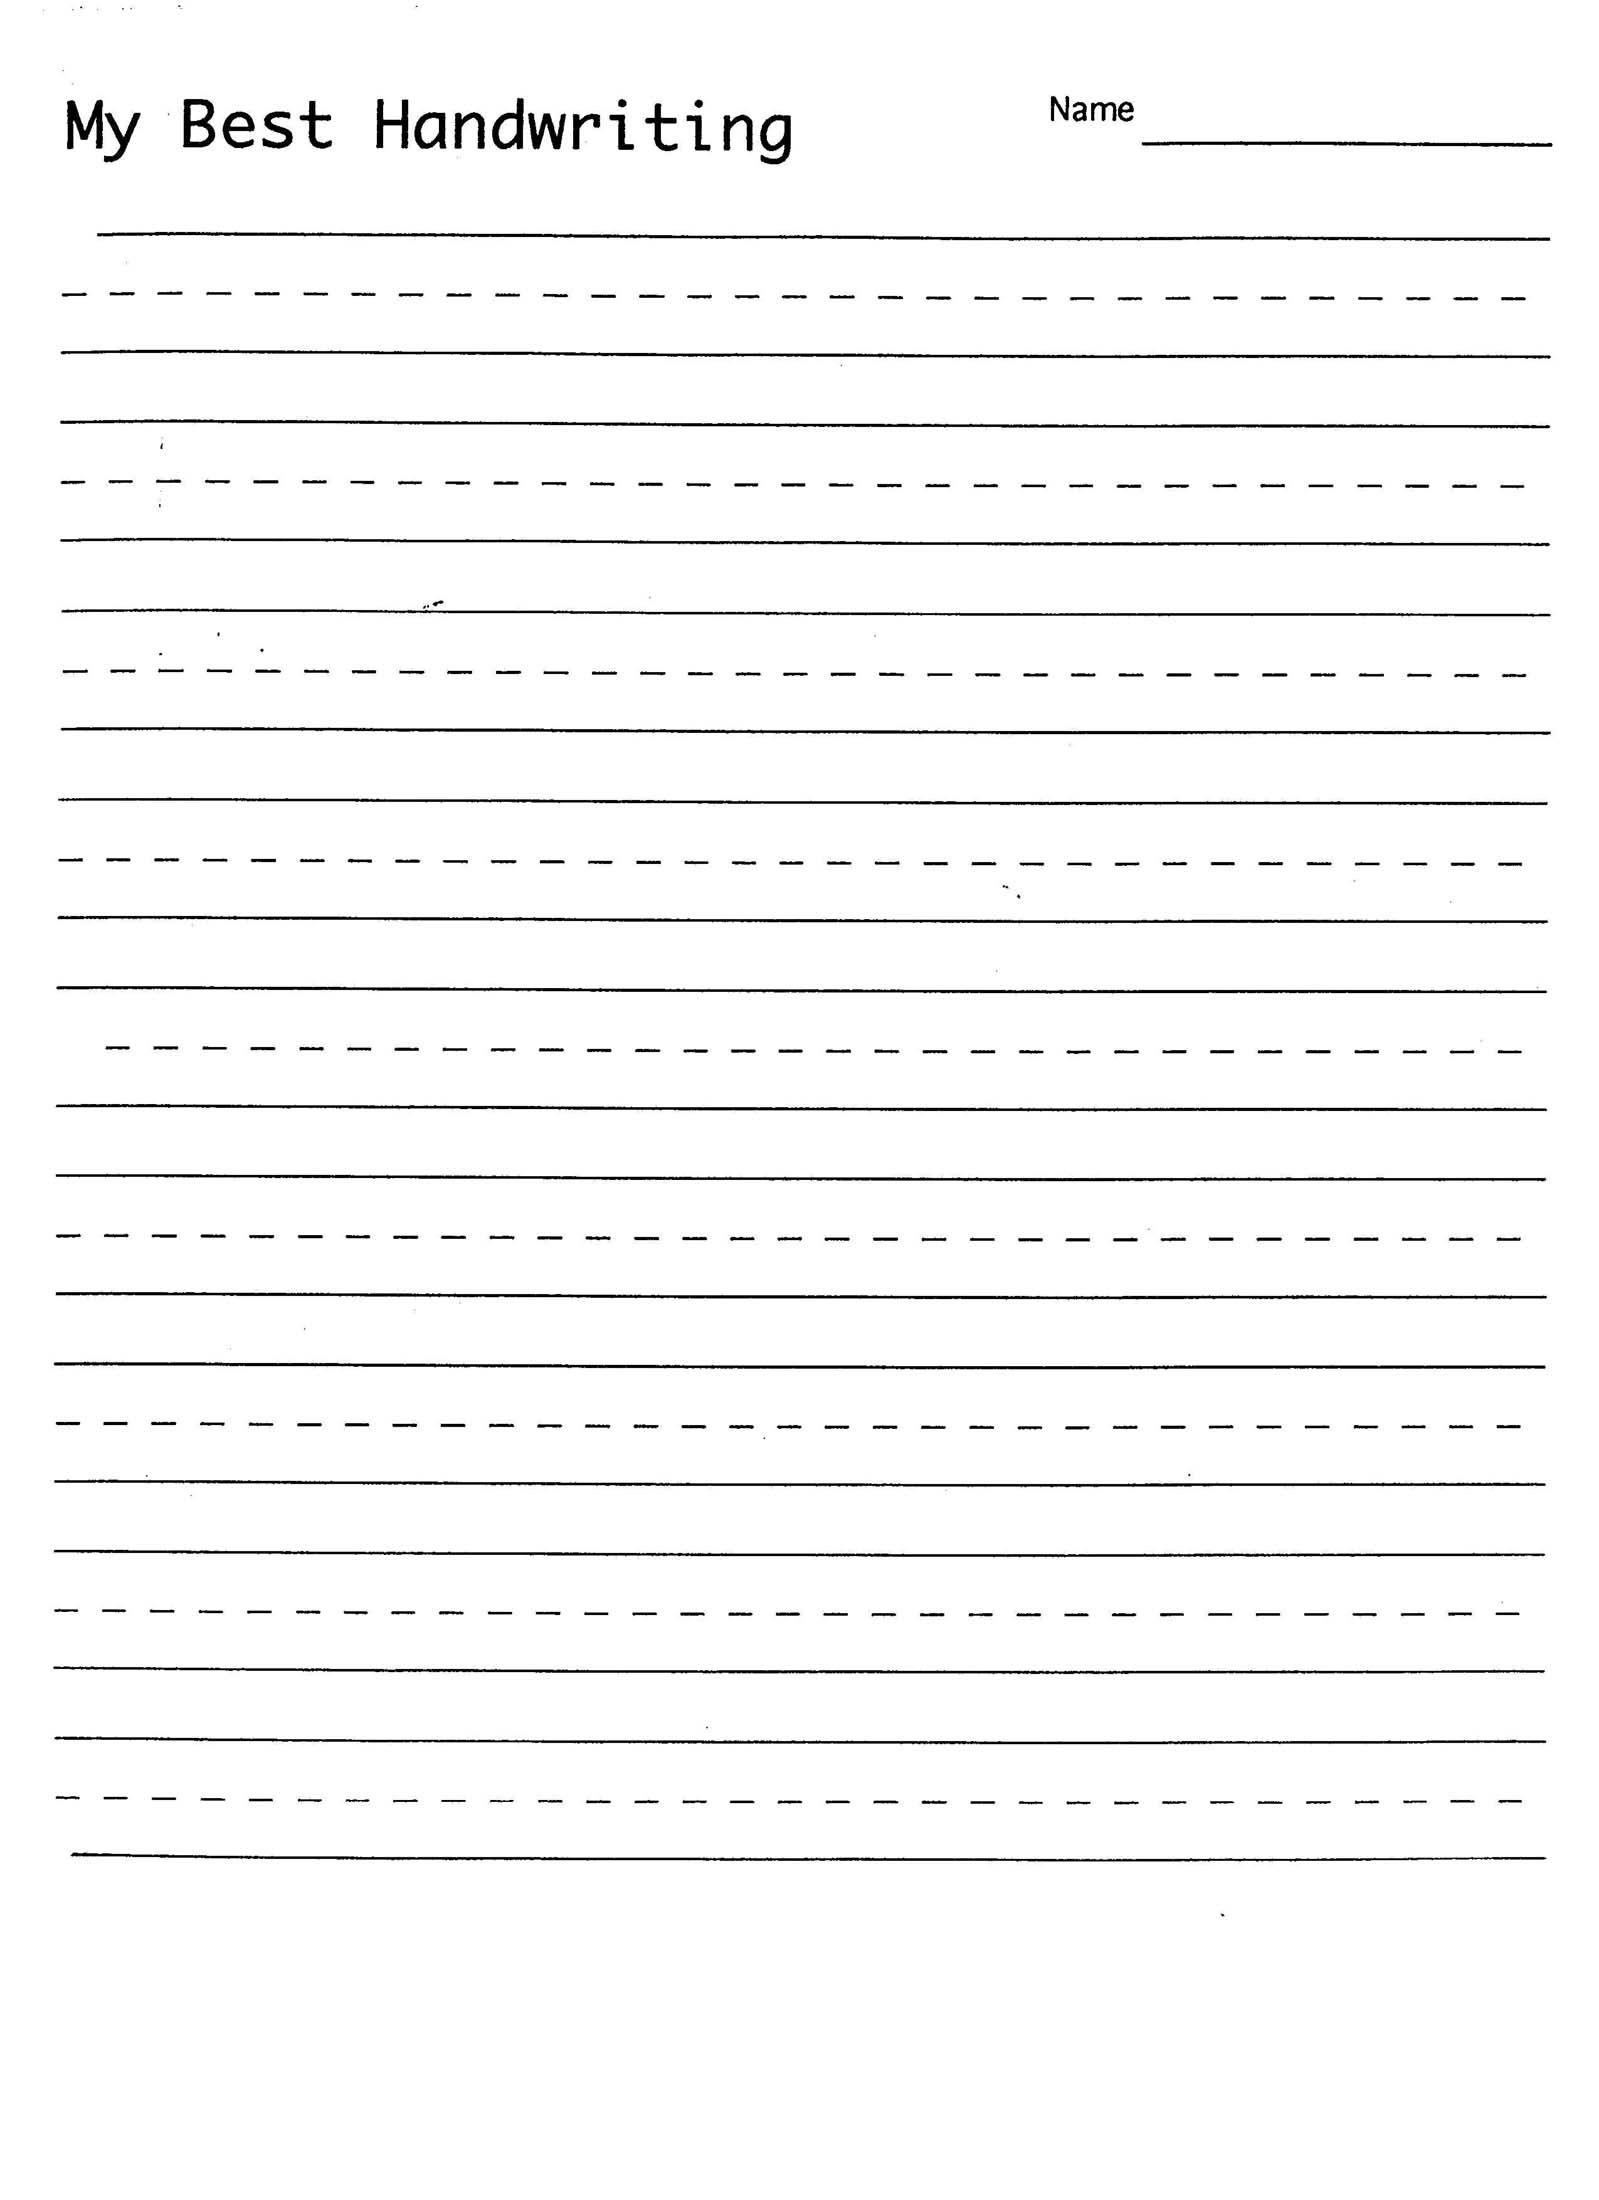 Handwriting Practice Sheet   1St Grade Handwriting   Writing   Printable Writing Worksheets